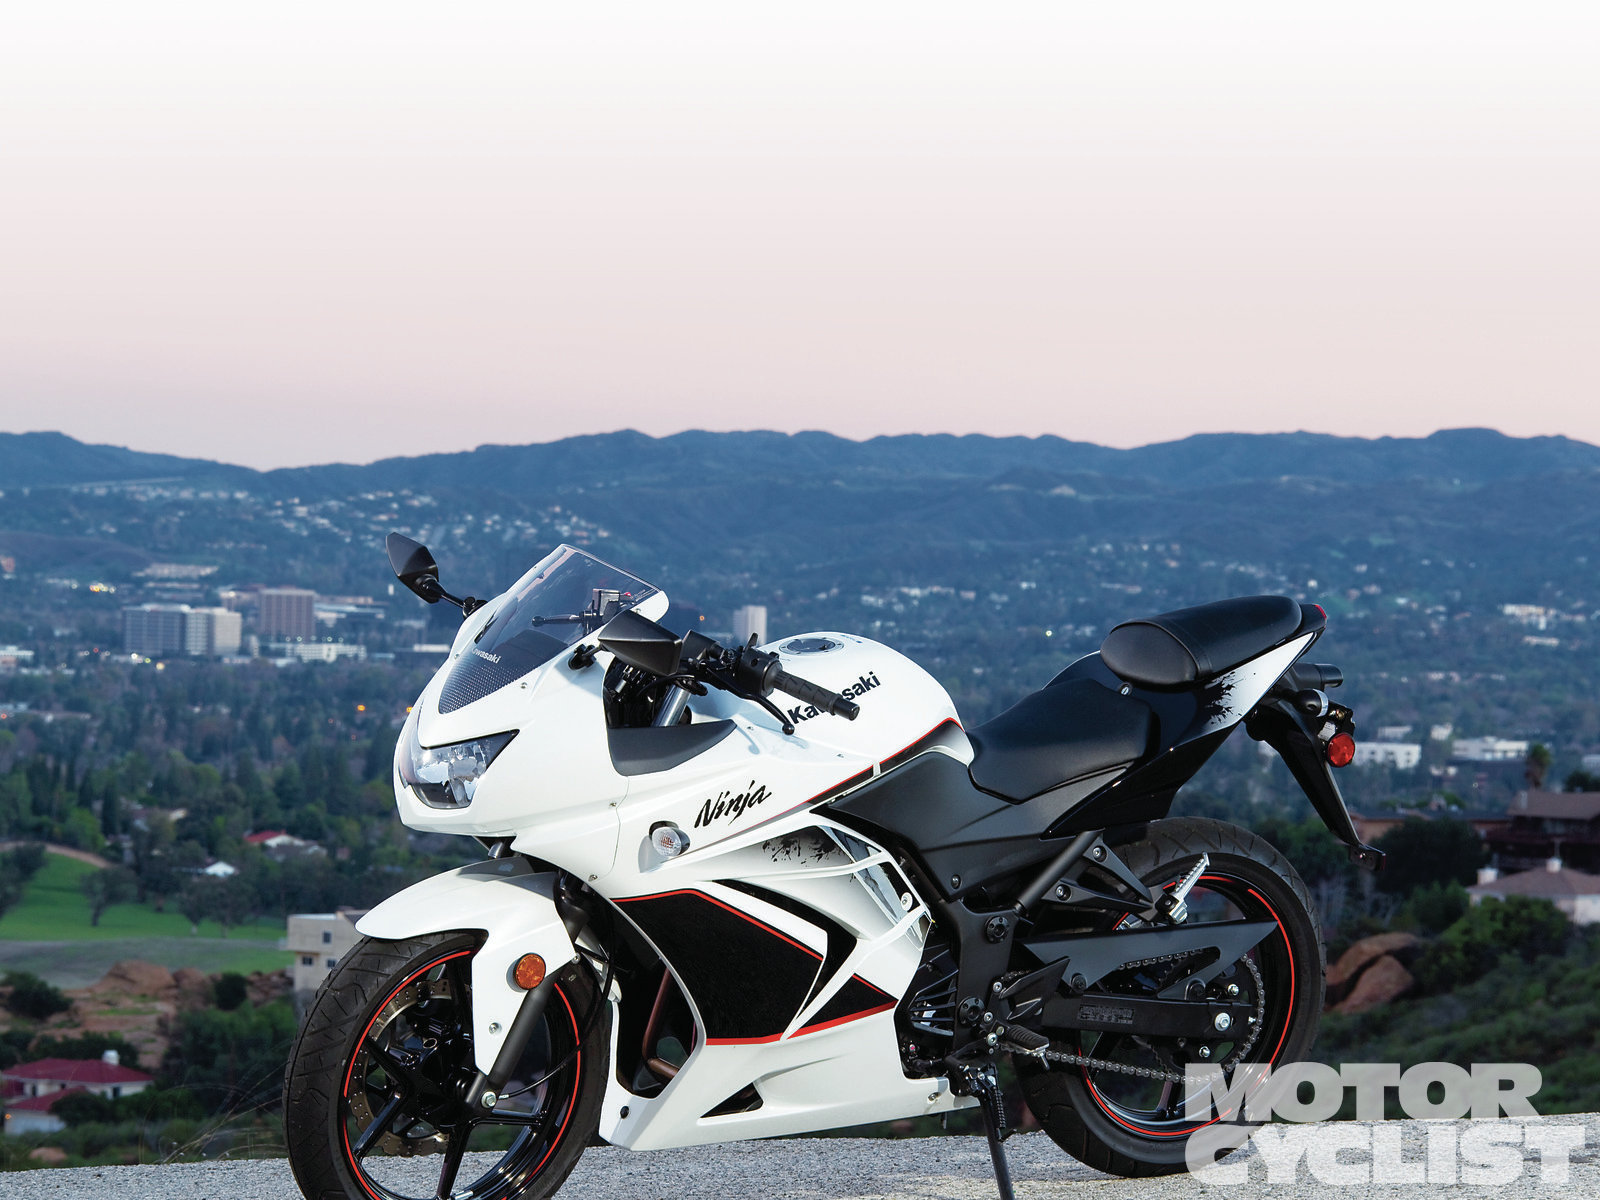 hyosung | Motorcyclist